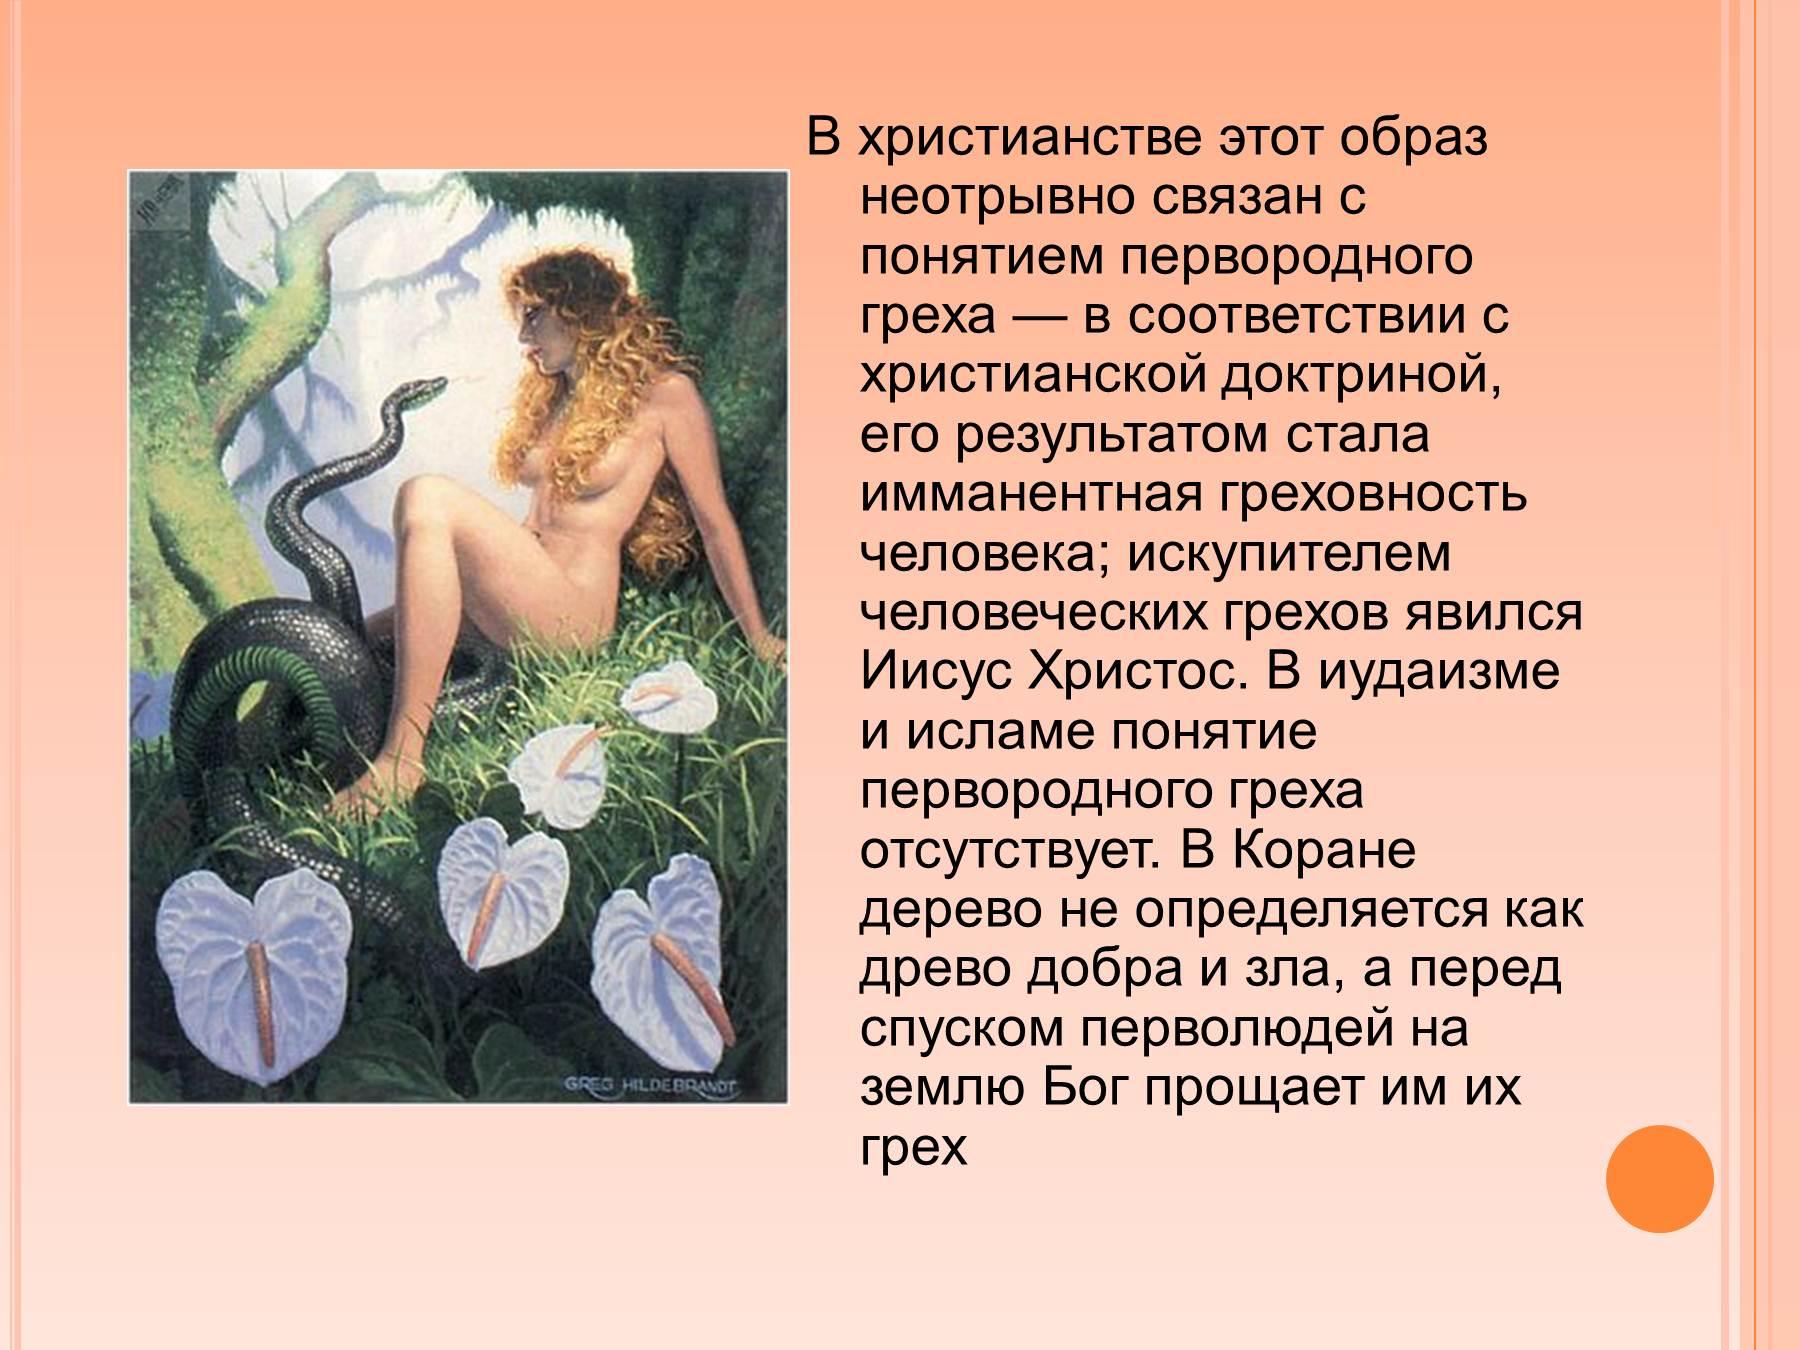 onanizm-greh